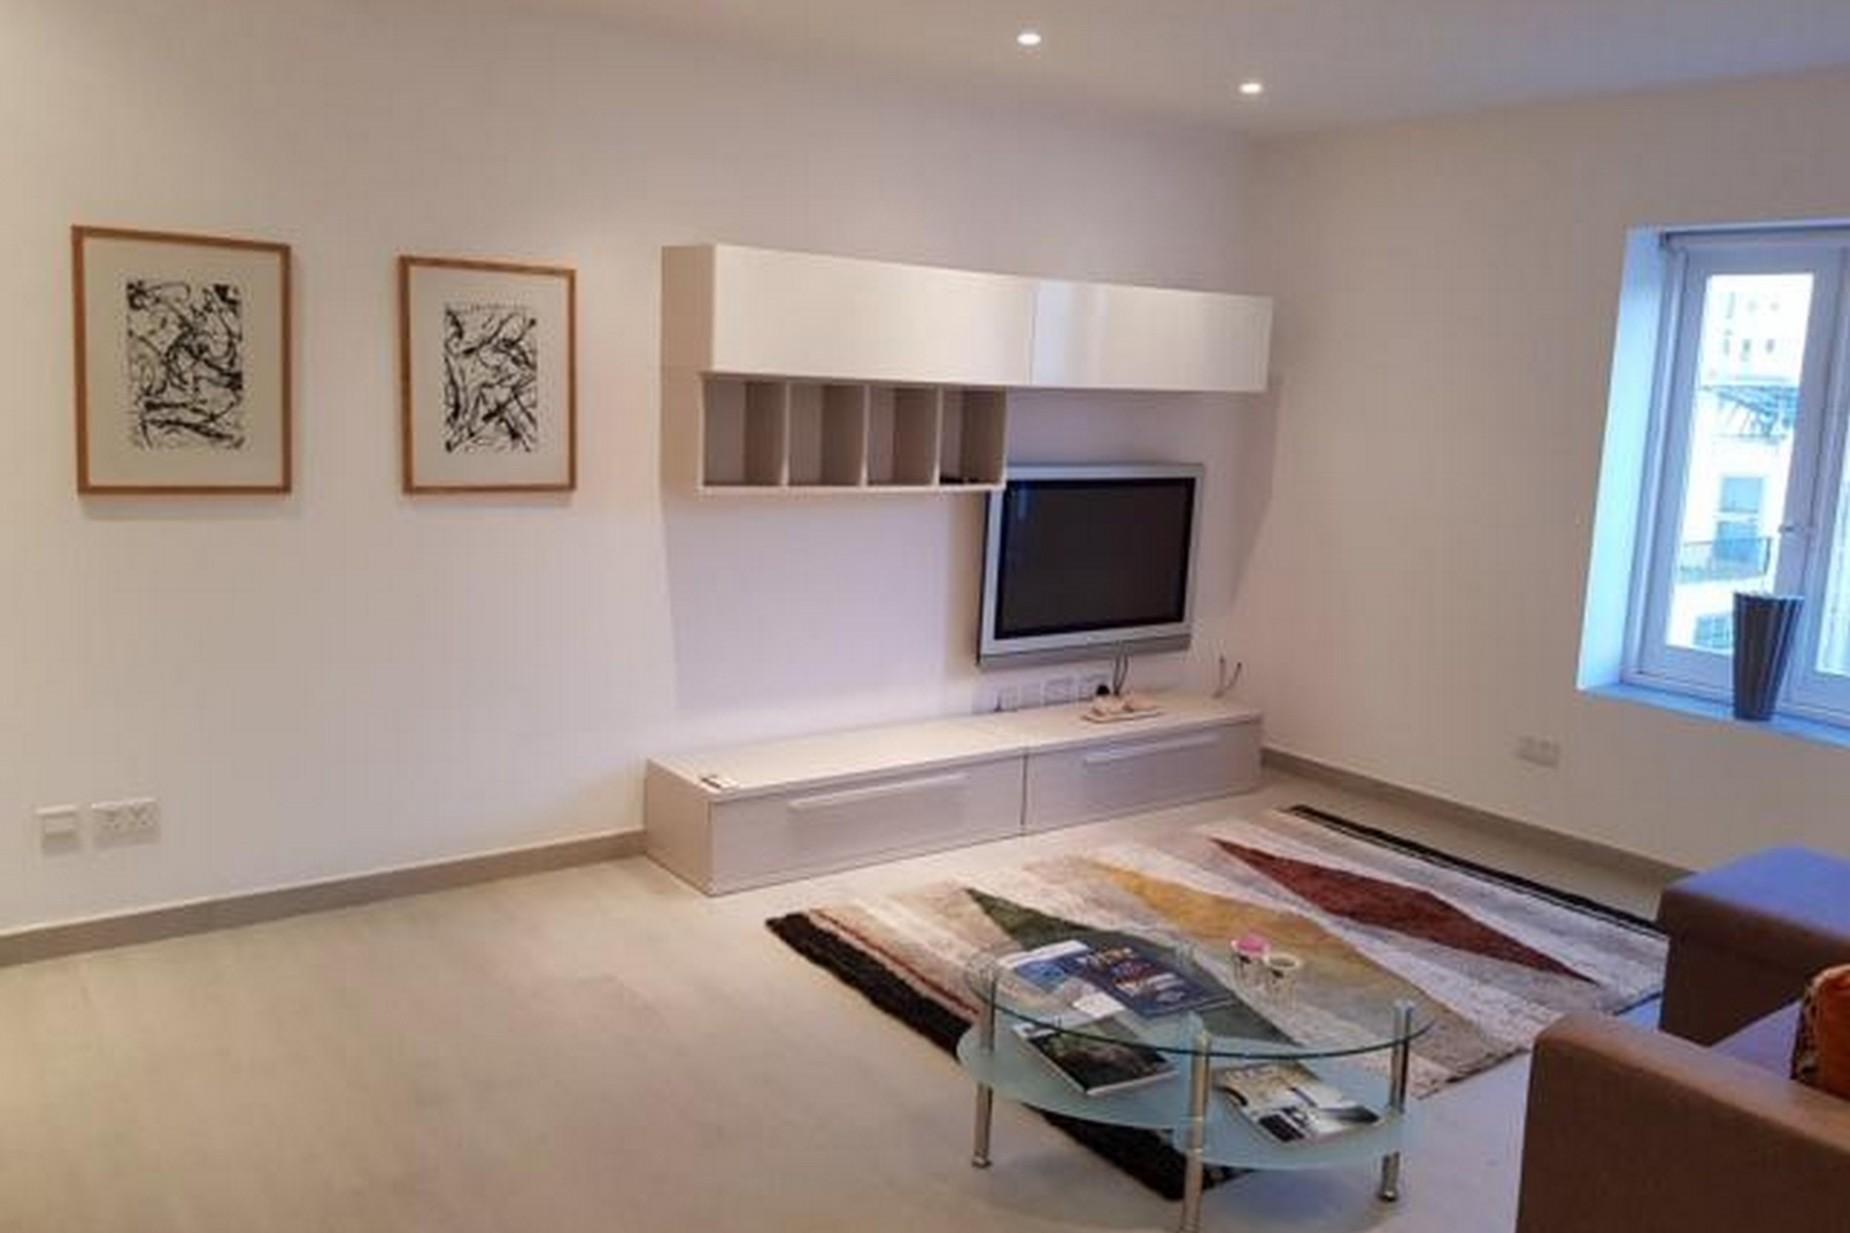 1 bed Apartment For Rent in Sliema, Sliema - thumb 6